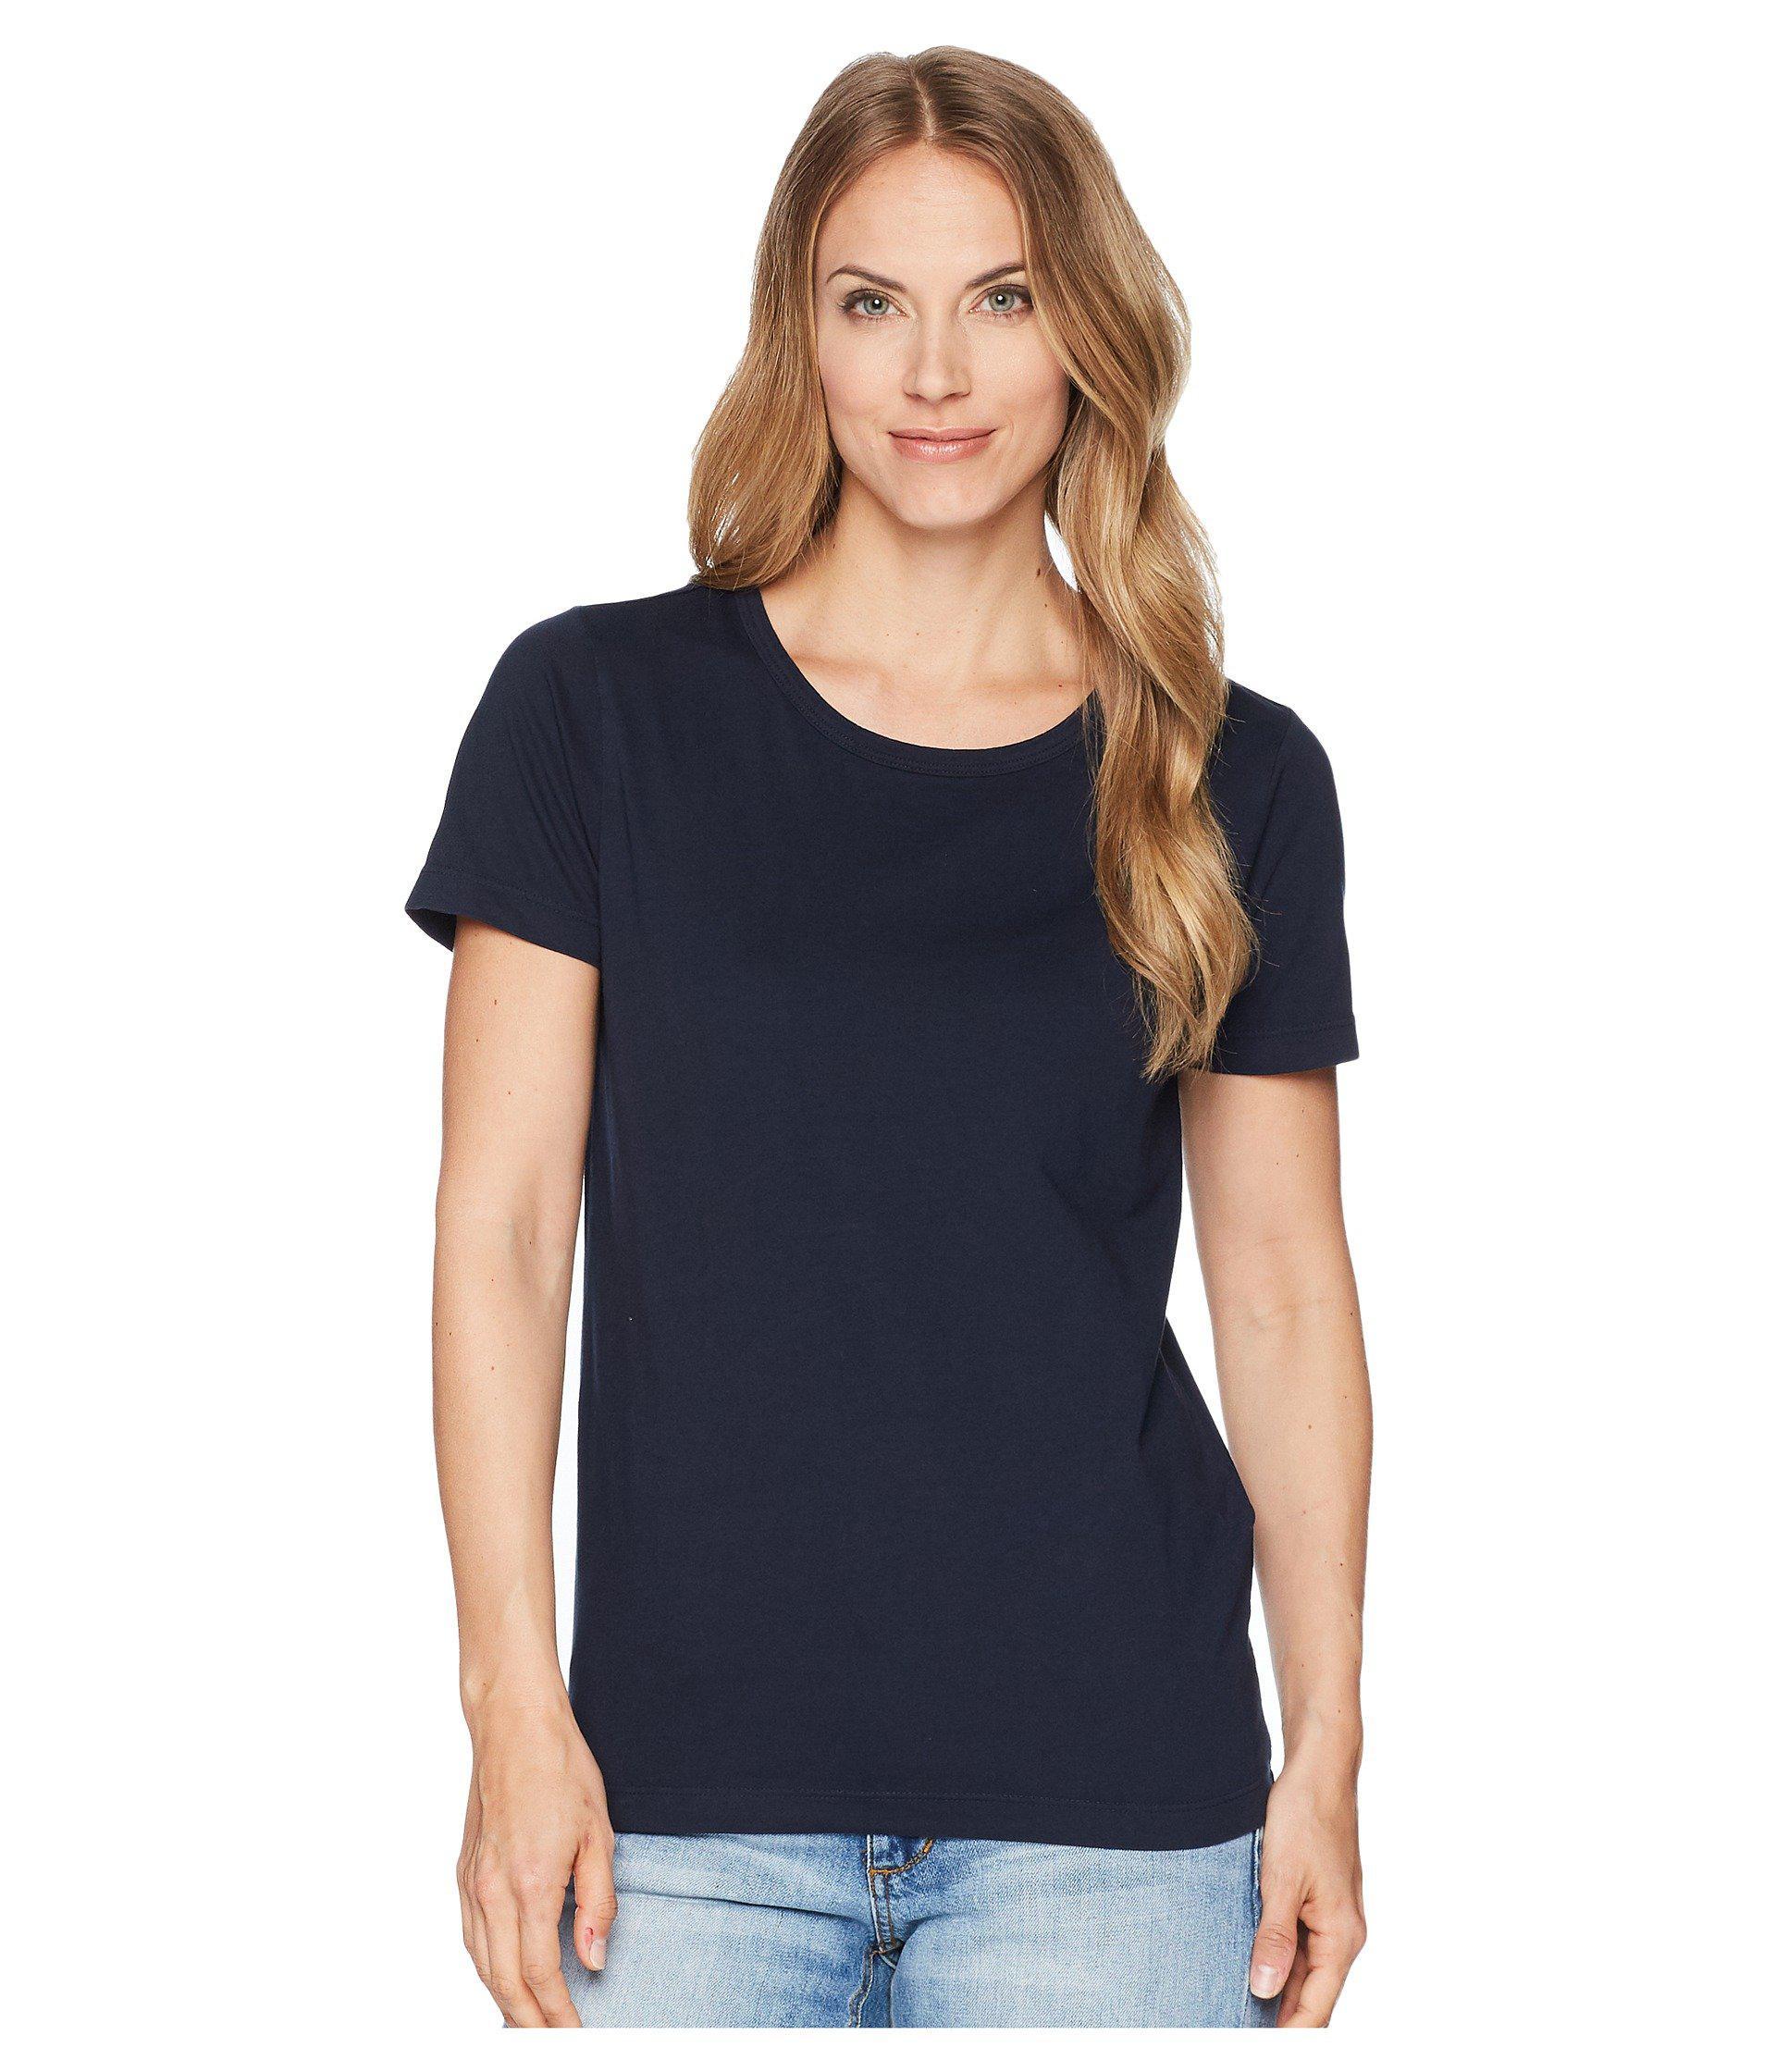 f5cf941c20d276 Lyst - Filson Whidbey Scoop Neck T-shirt (field Olive) Women s ...